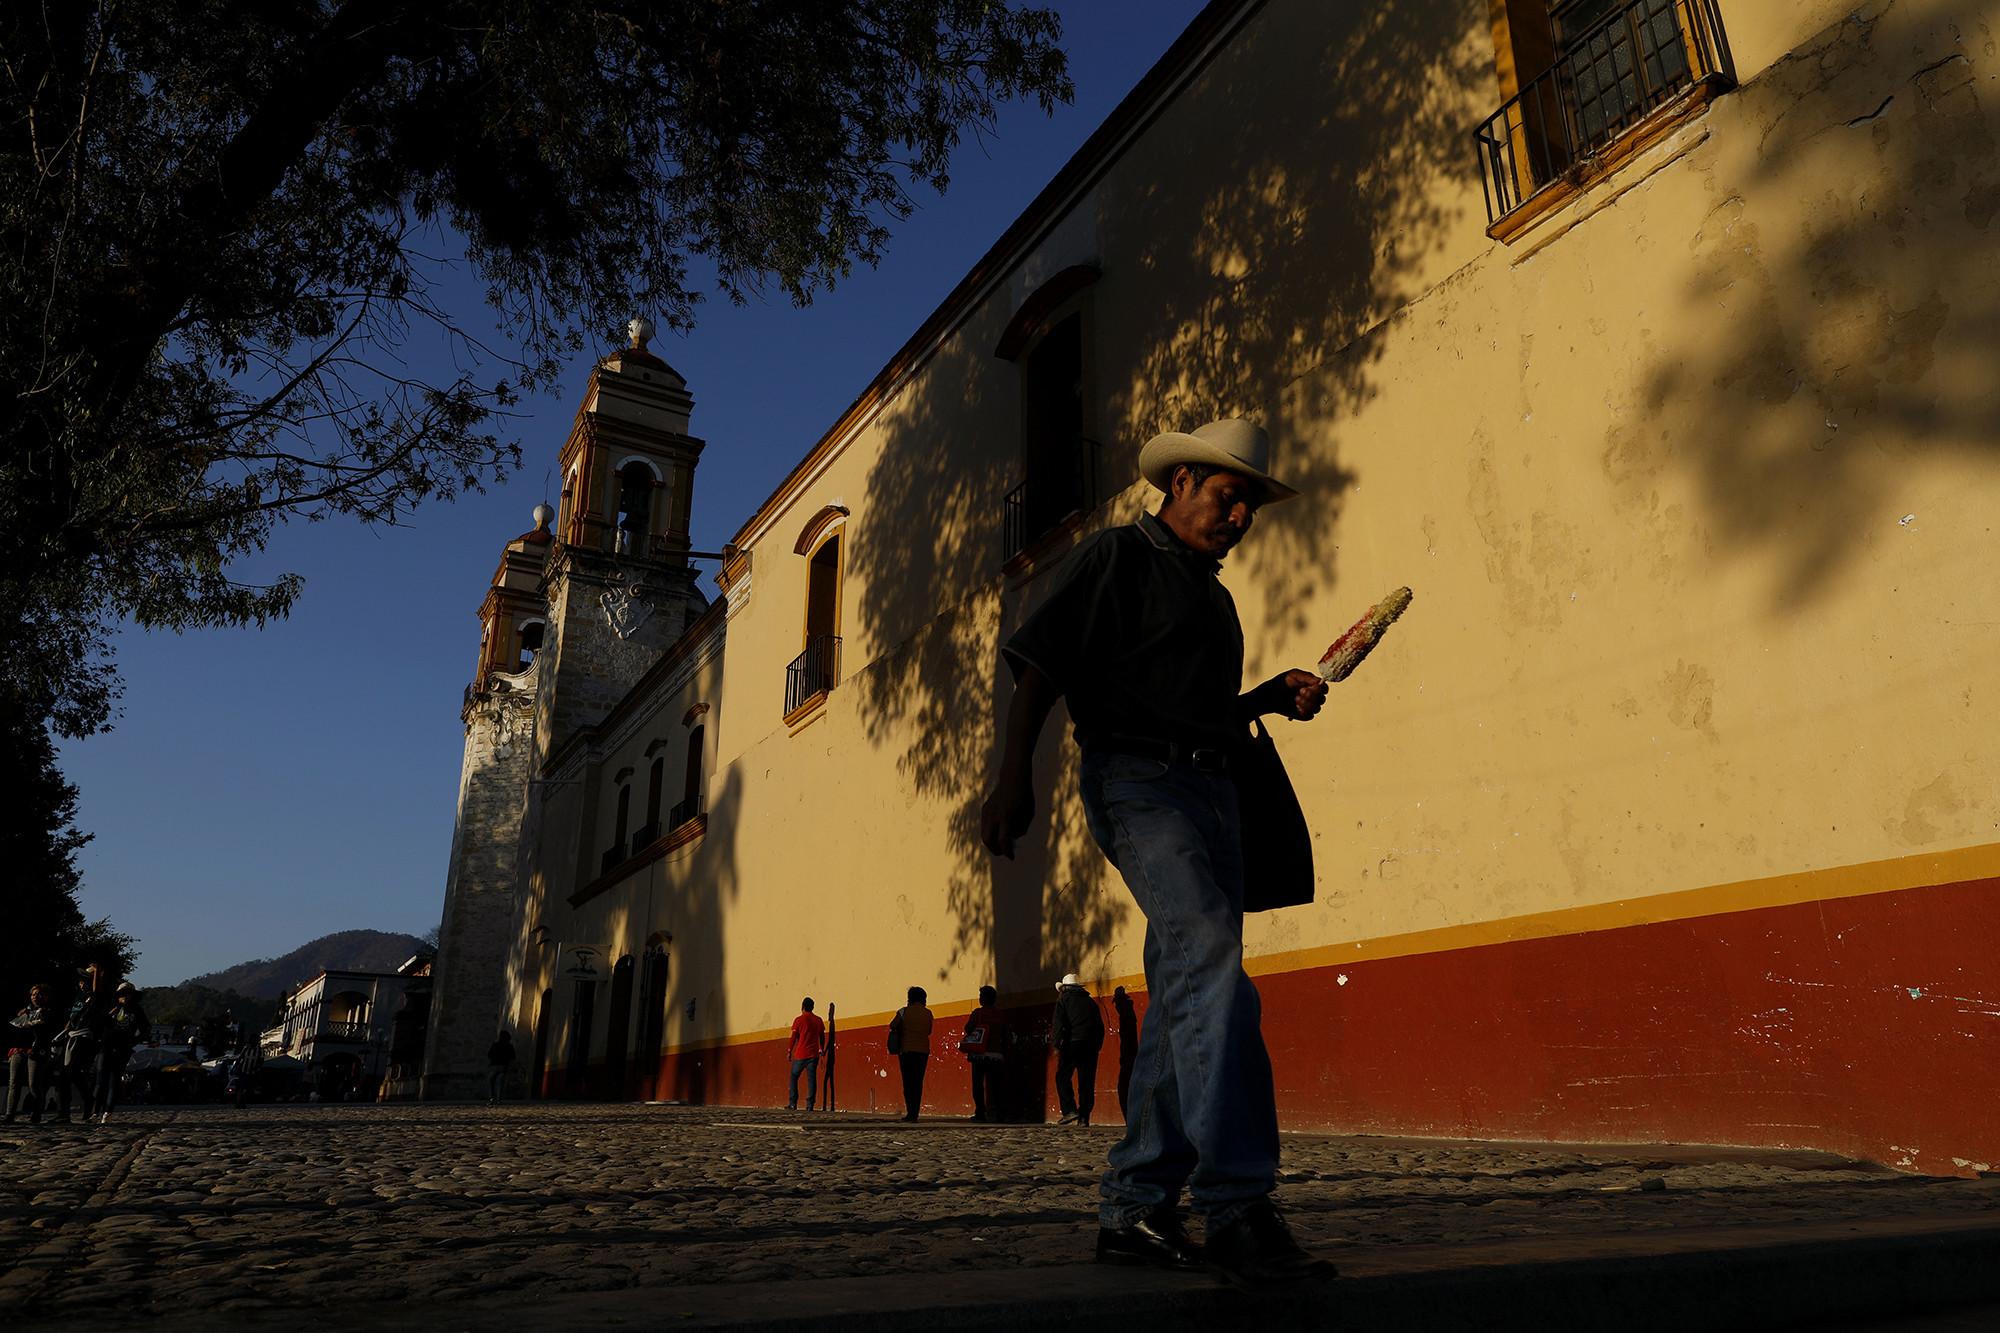 TLAXIACO, OAXACA — MONDAY, FEBRUARY 4, 2019: Nuestra Señora de la Asuncion Catholic church that an